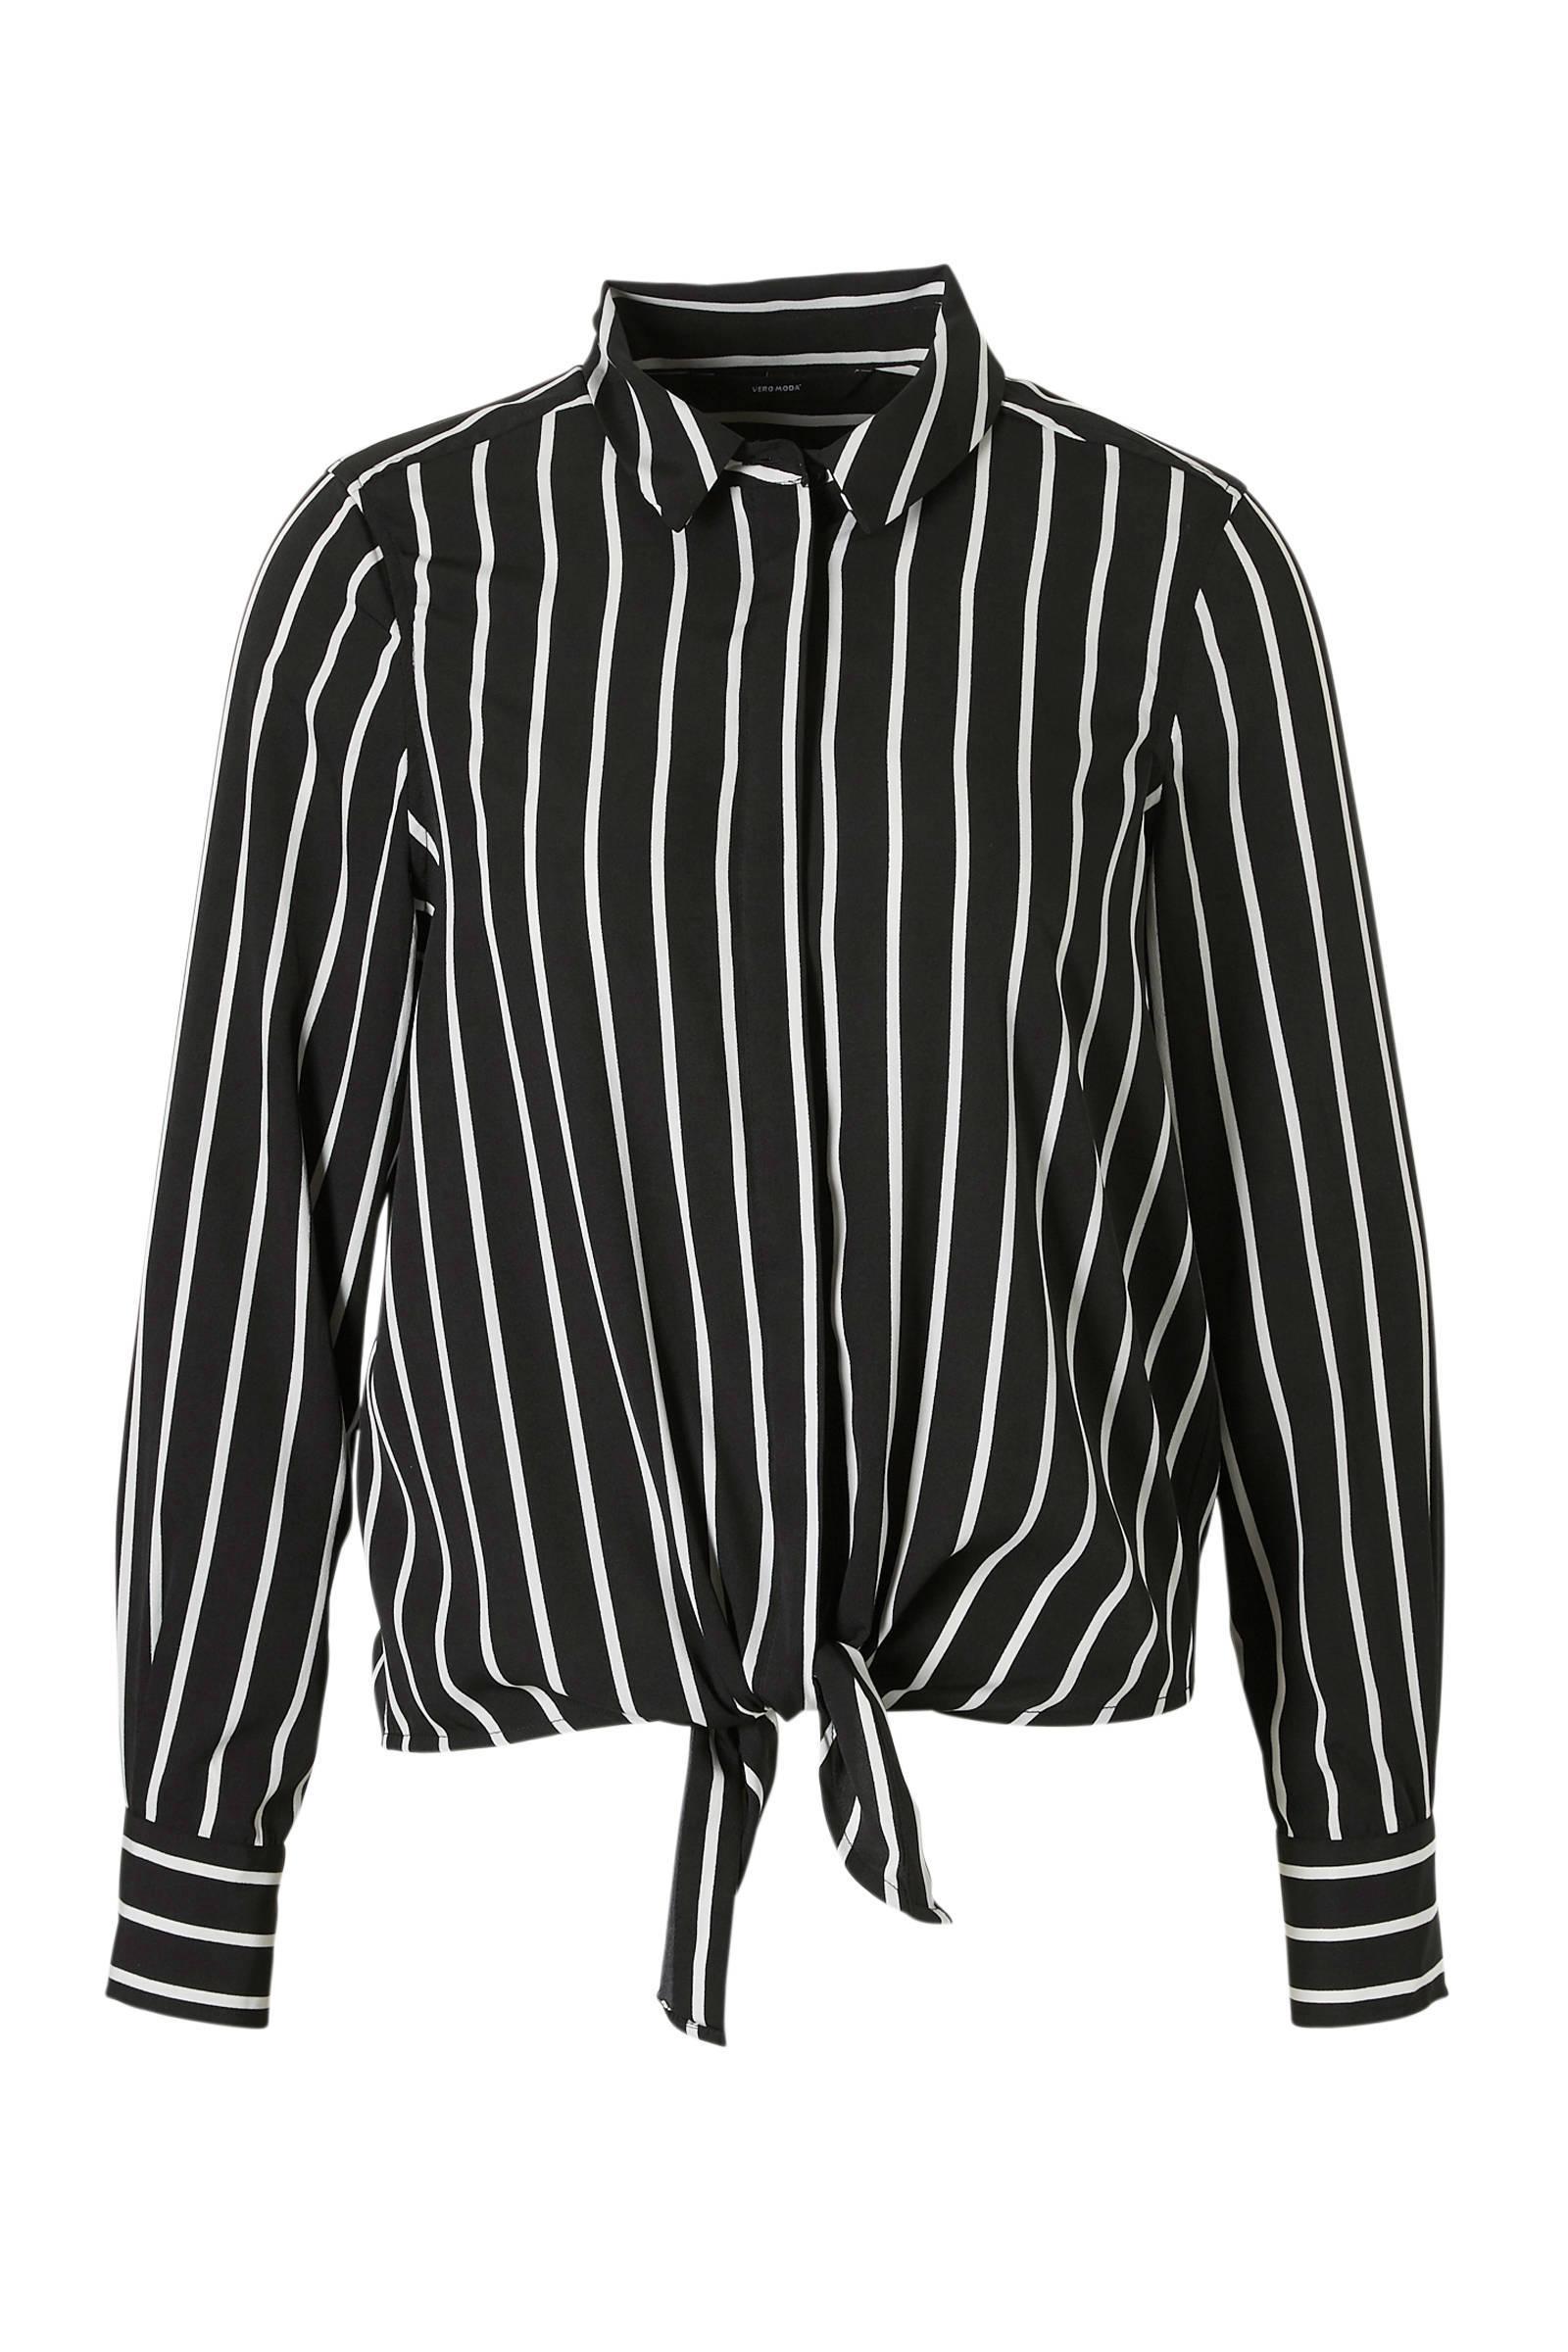 blouse zwart wit gestreept